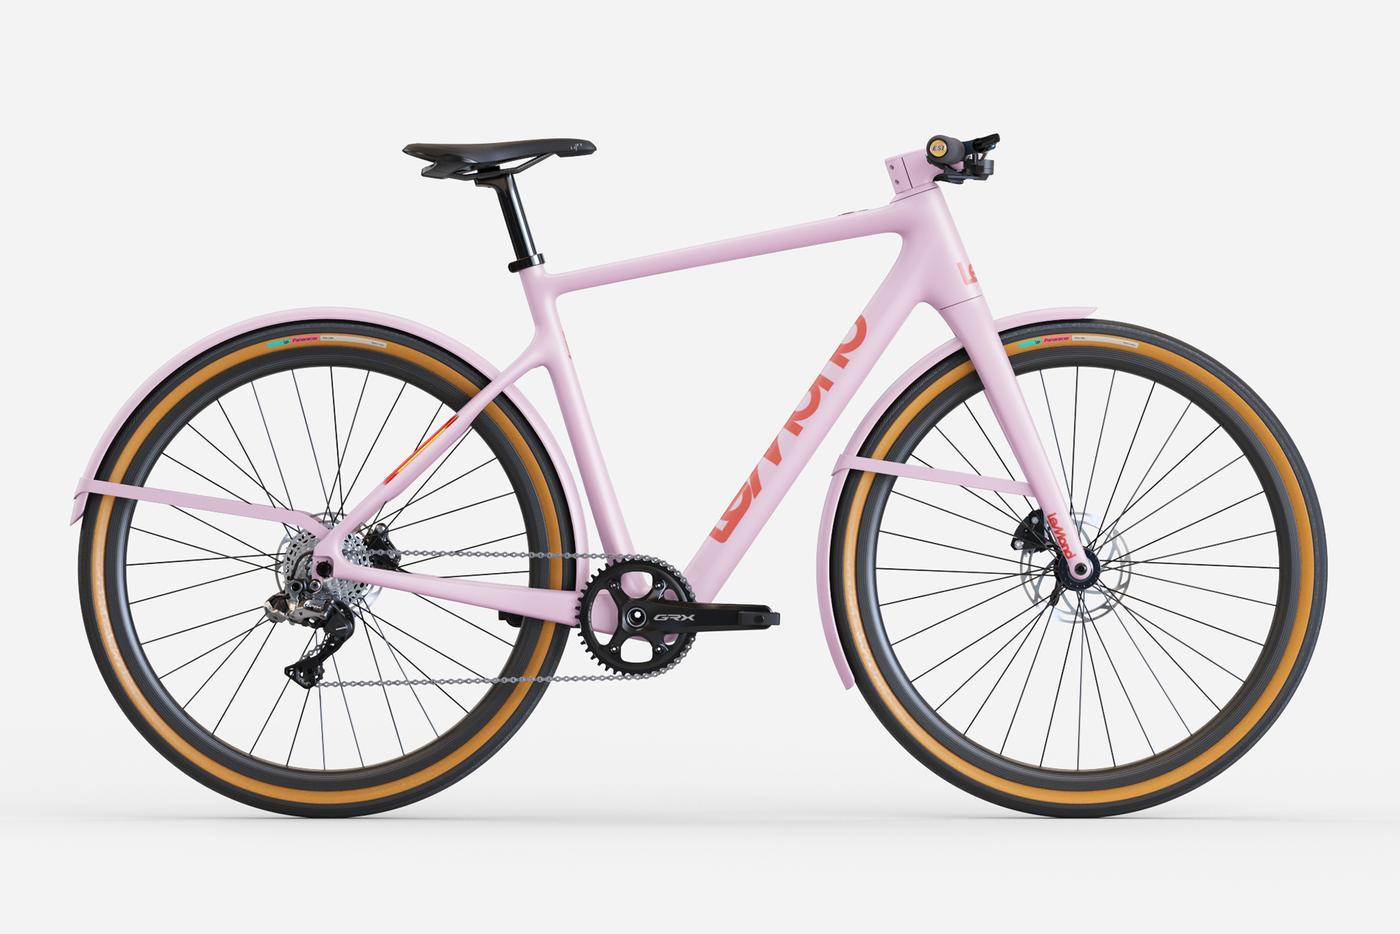 LeMond Bicycles Rolls Out Two Carbon Fiber e-Bike Models